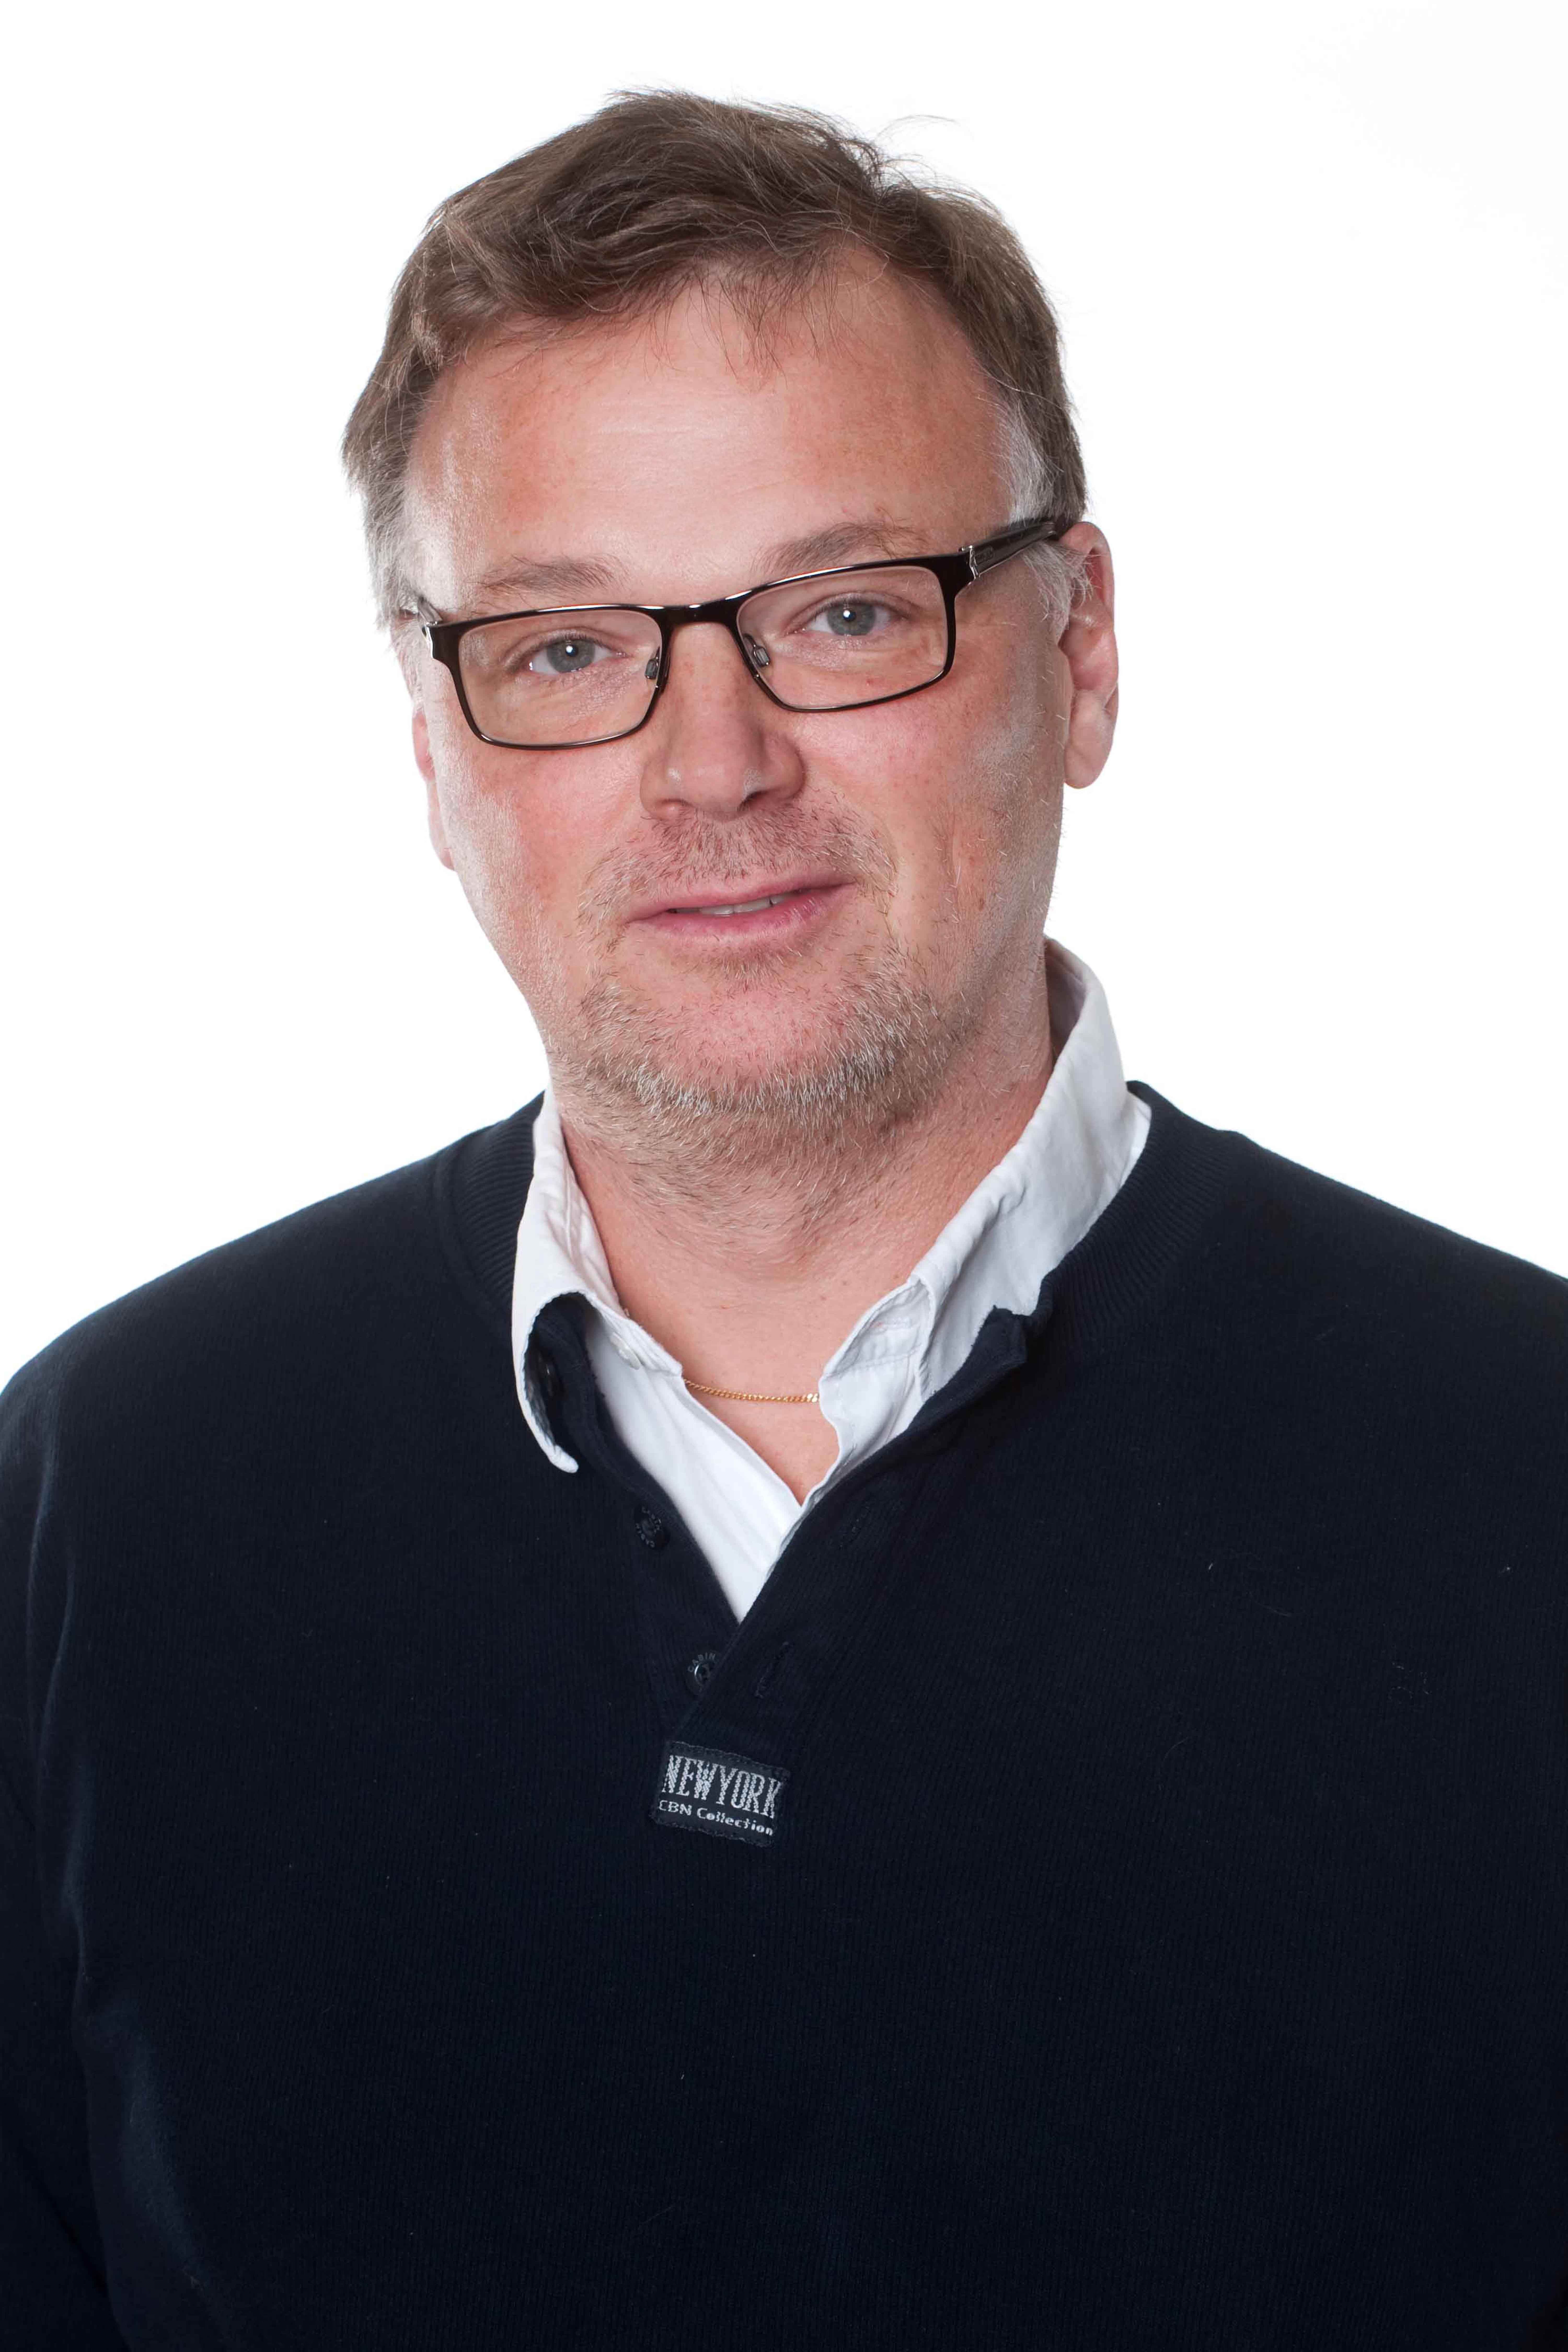 Niclas G. Karlsson